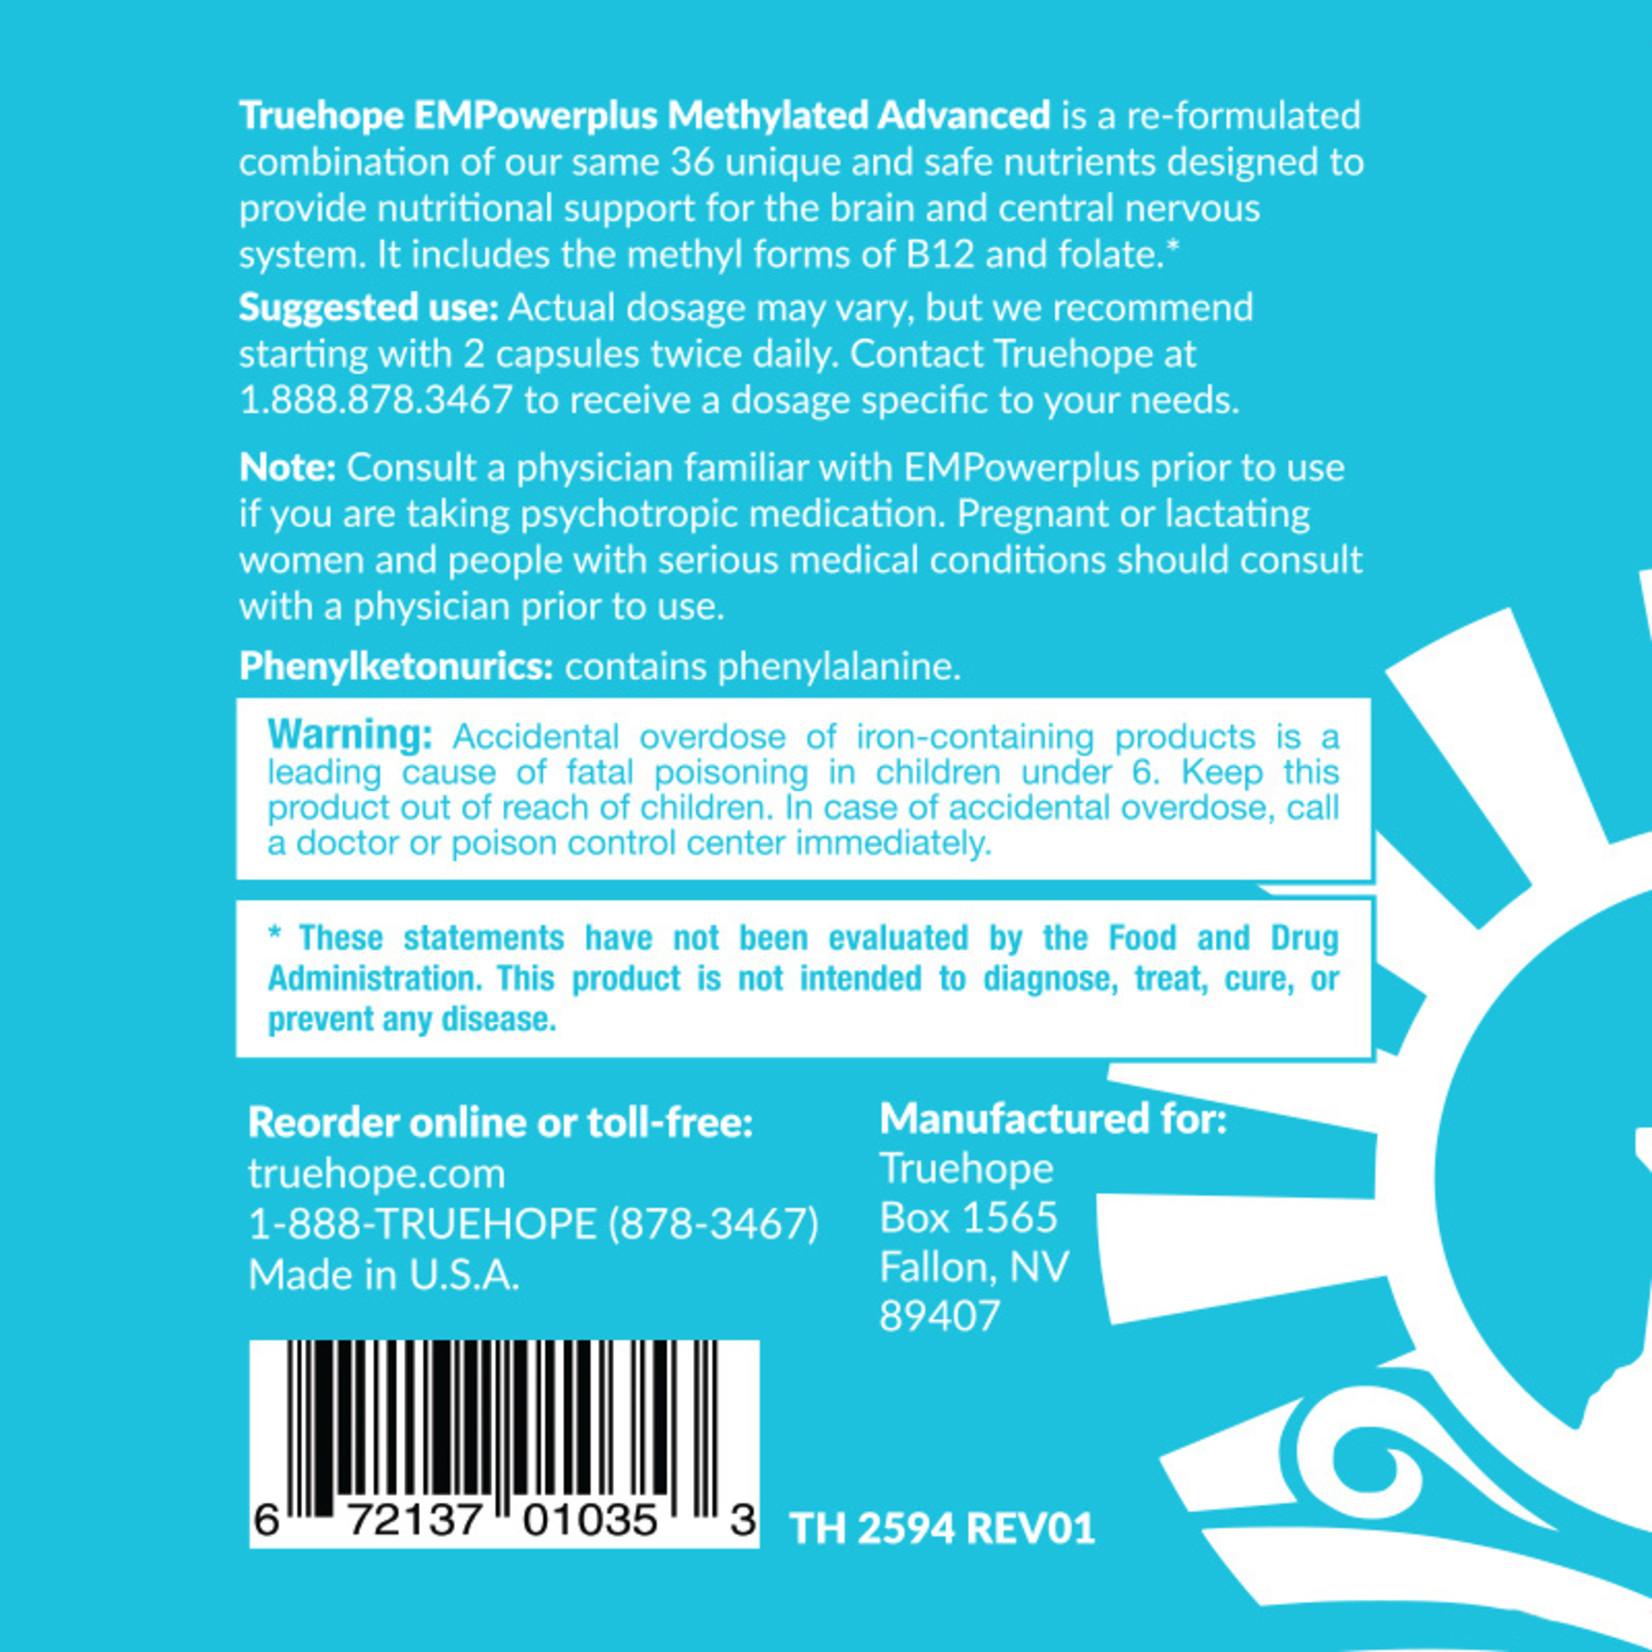 True Hope EMPowerplus Methylated Advanced